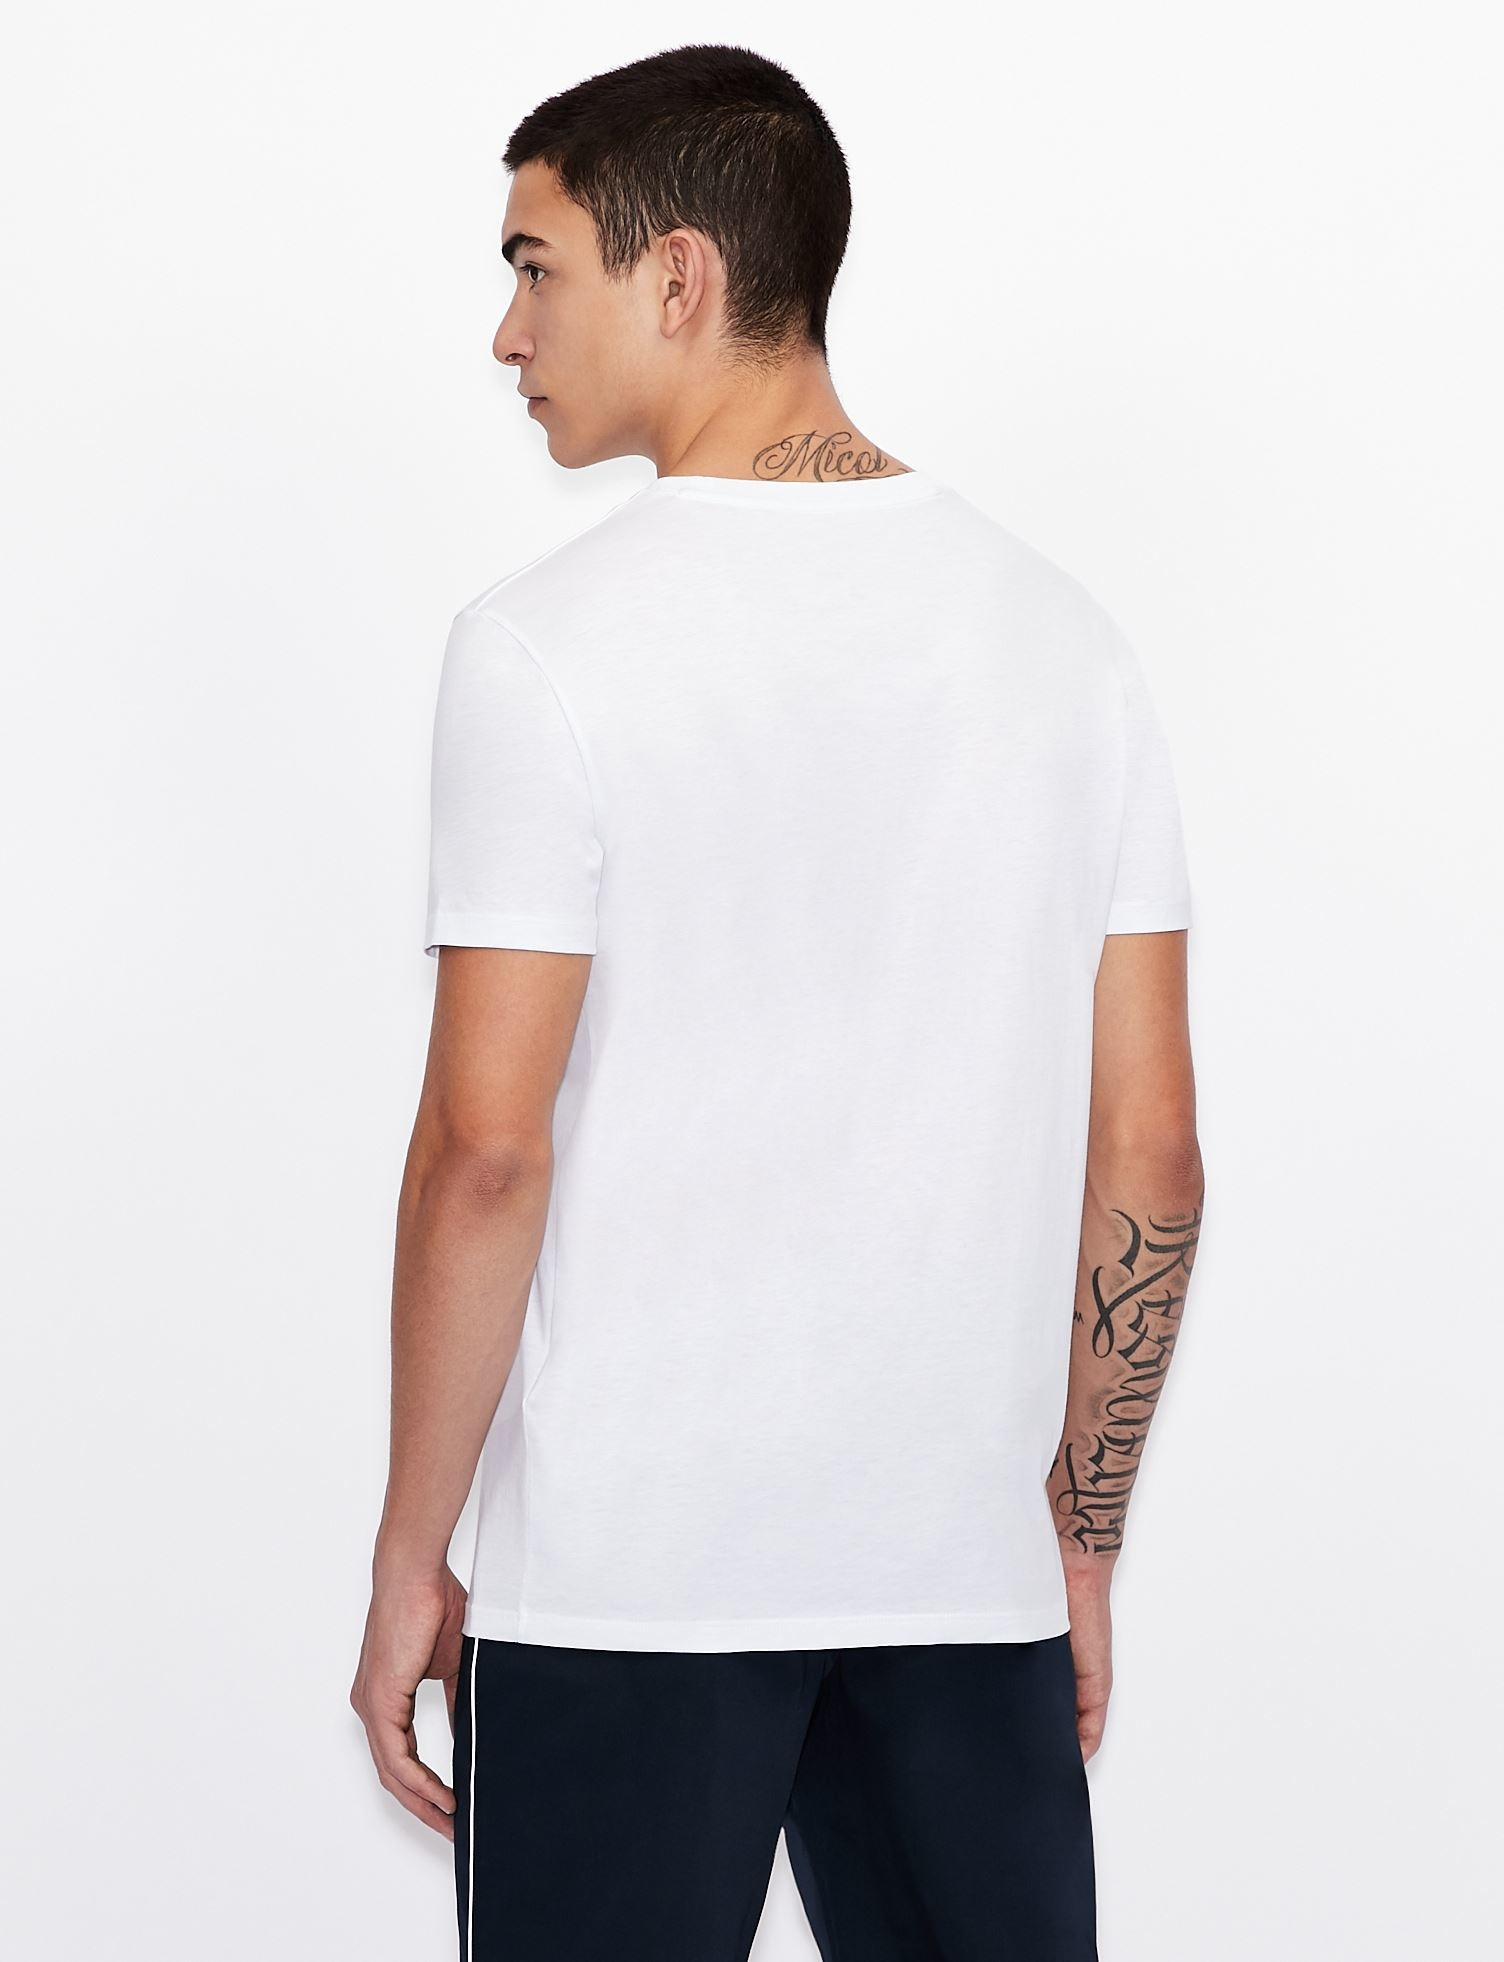 Armani Exchange T-shirt Armani Exchange 3KZTAA-ZJA5Z-1100